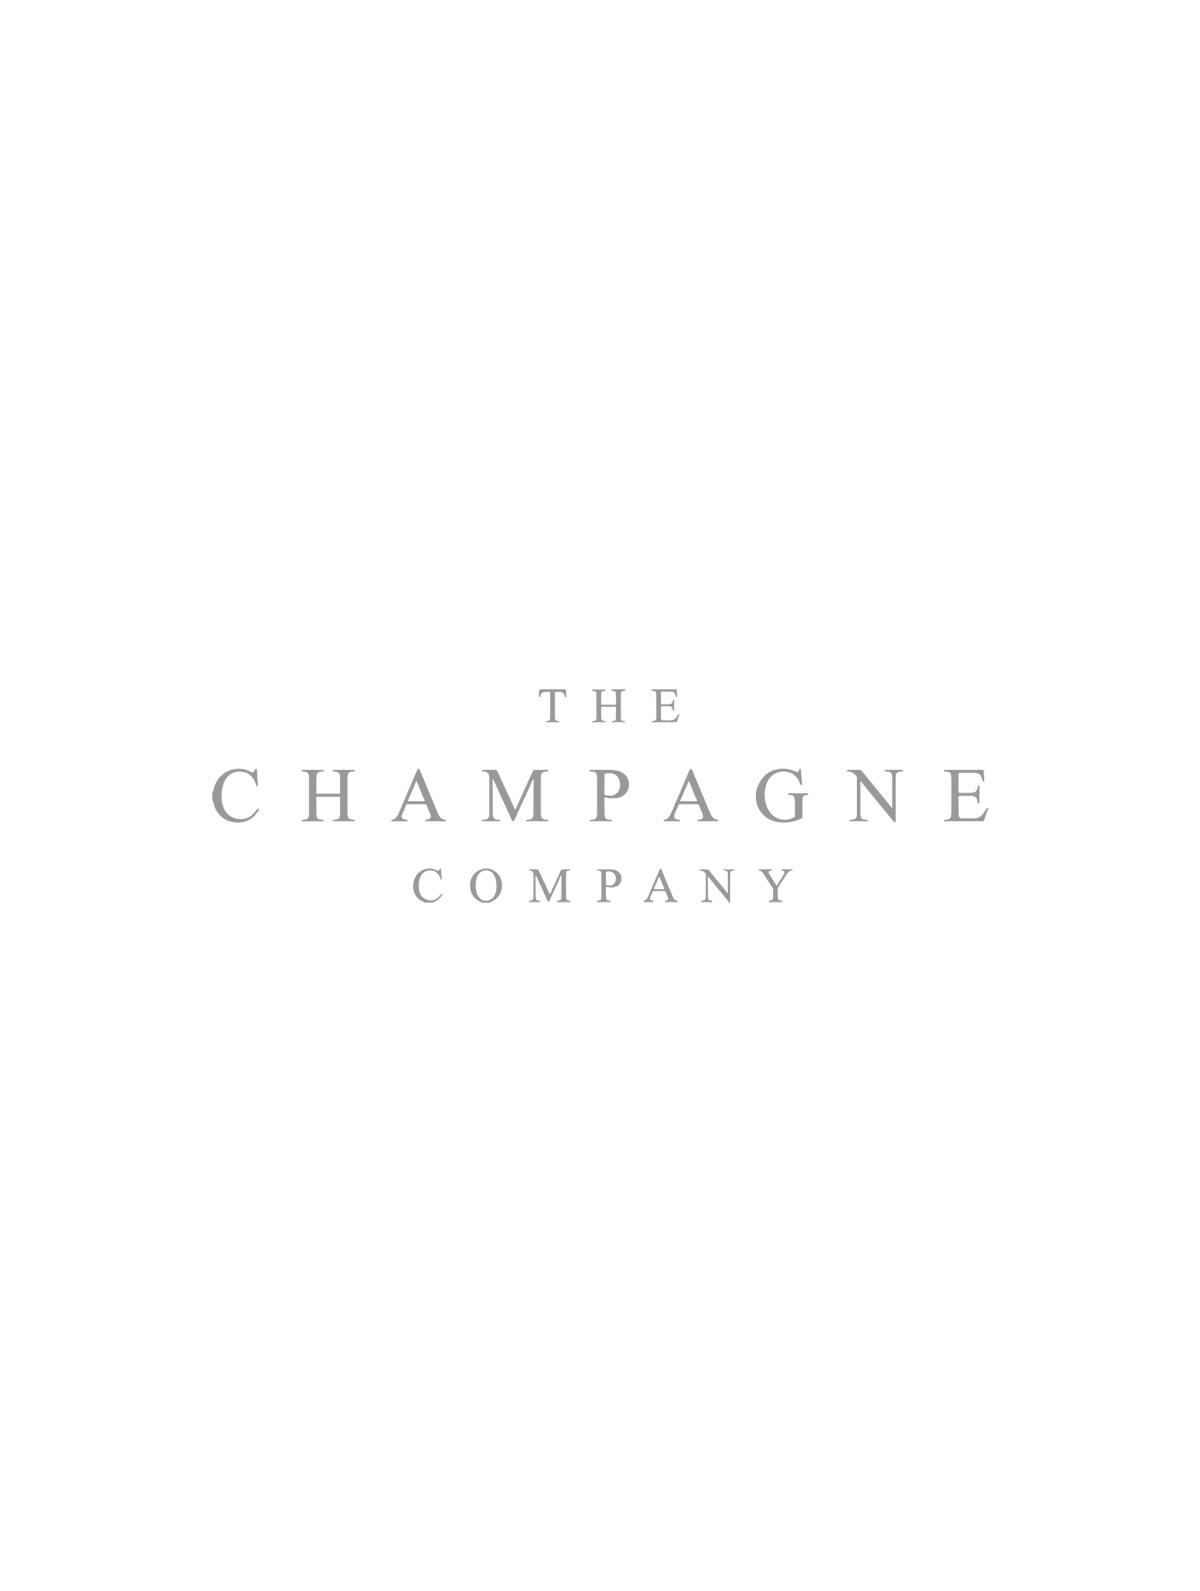 Laurent Perrier Jeroboam Brut Champagne 300cl & 12 LSA Moya Flutes